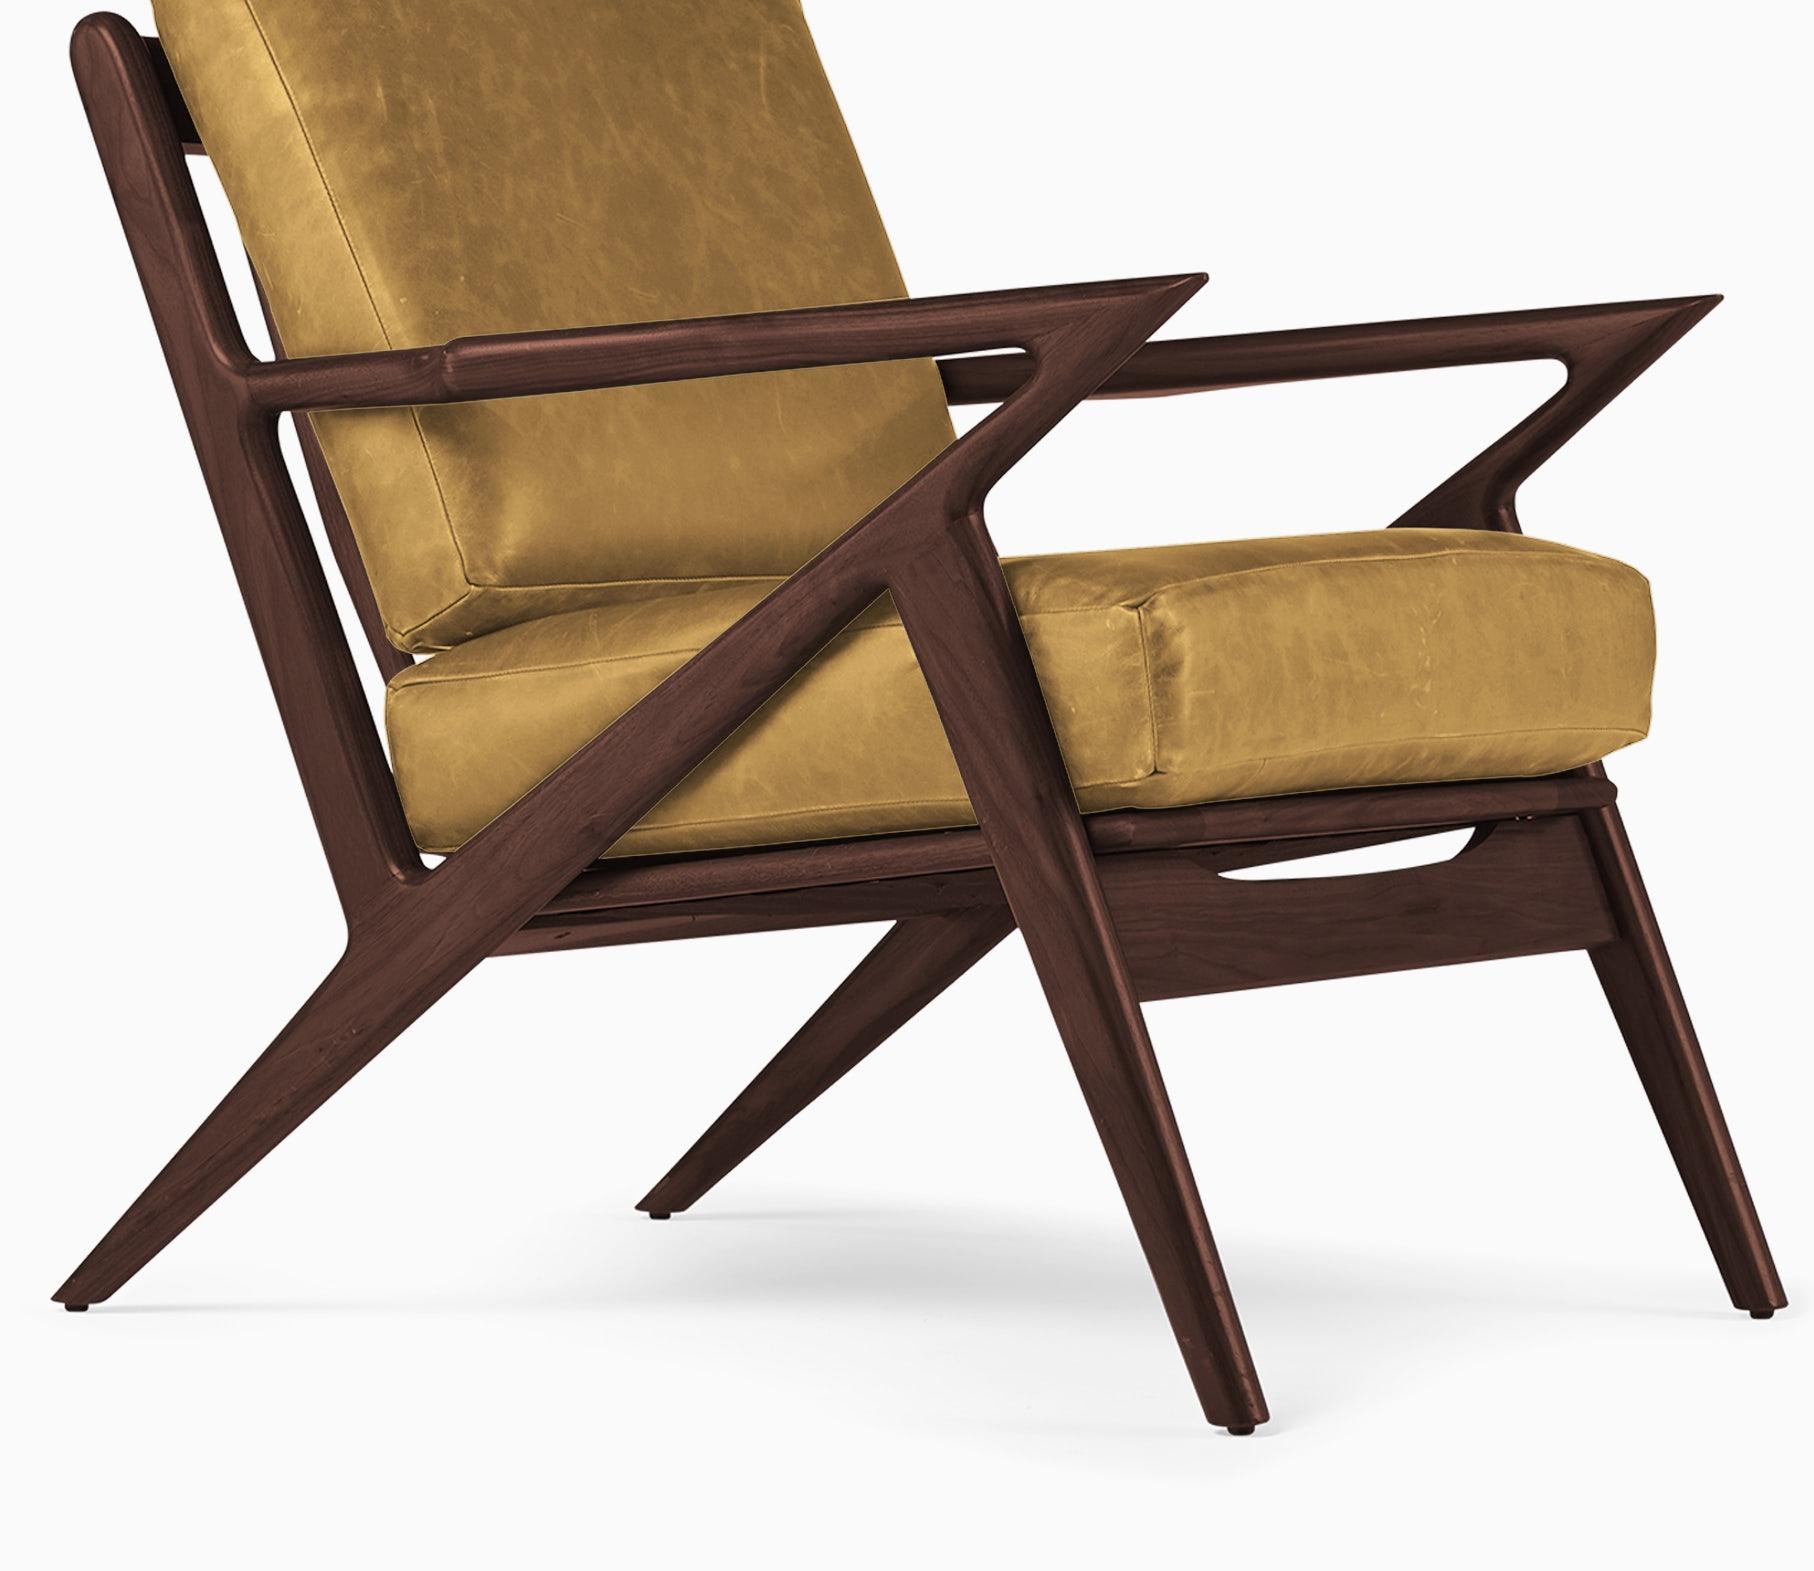 soto leather chair colonade sycamore